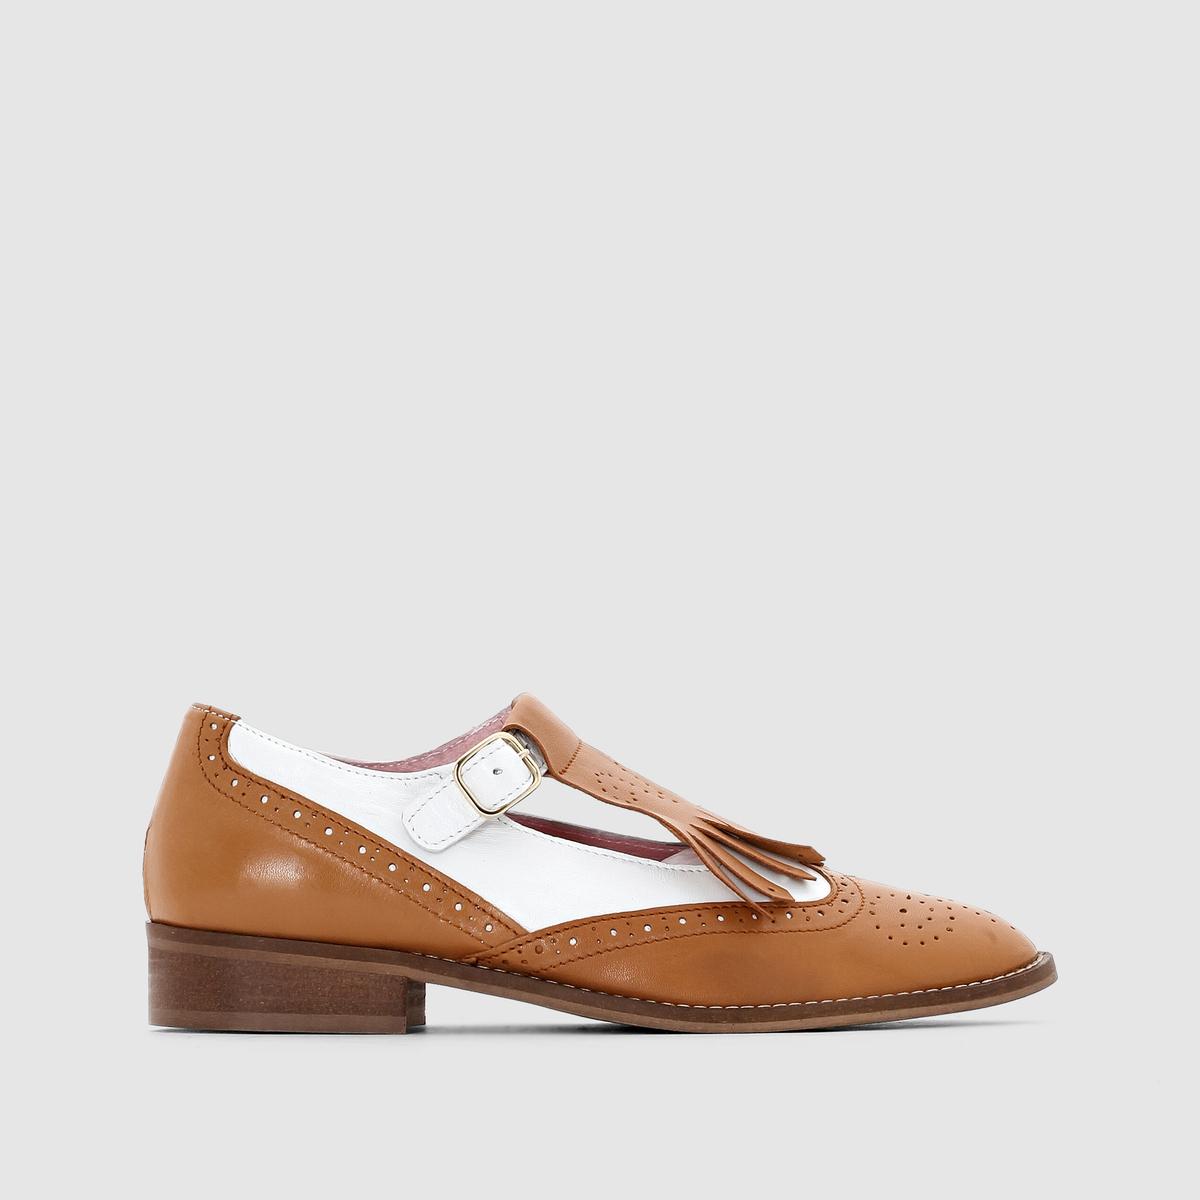 Ботинки-дерби из кожи ботинки дерби под кожу питона